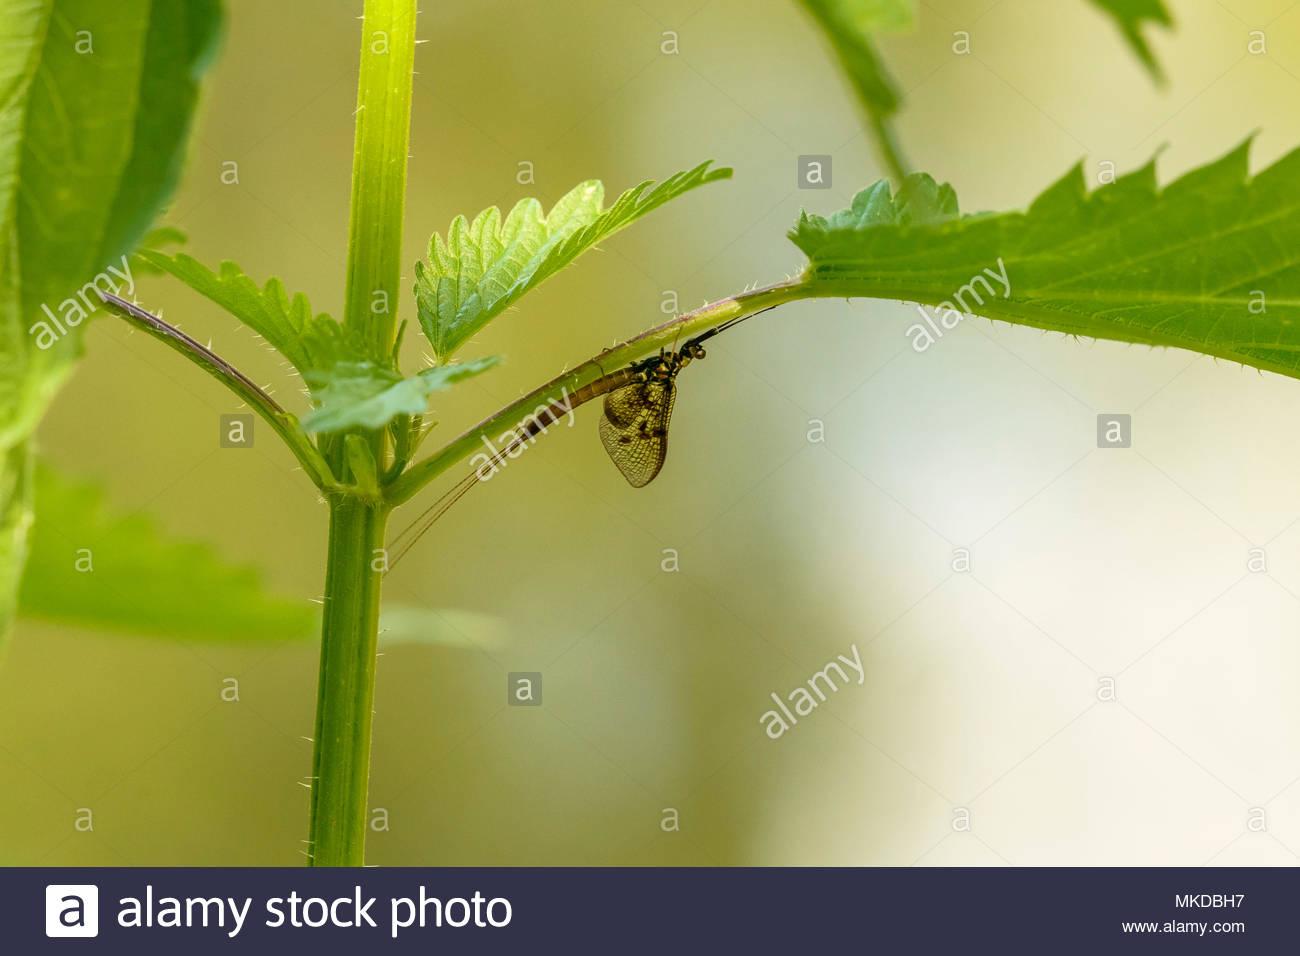 Mayfly (Ephemera danica) on a leaf, Aisy-sur-Armancon, Burgundy, France - Stock Image